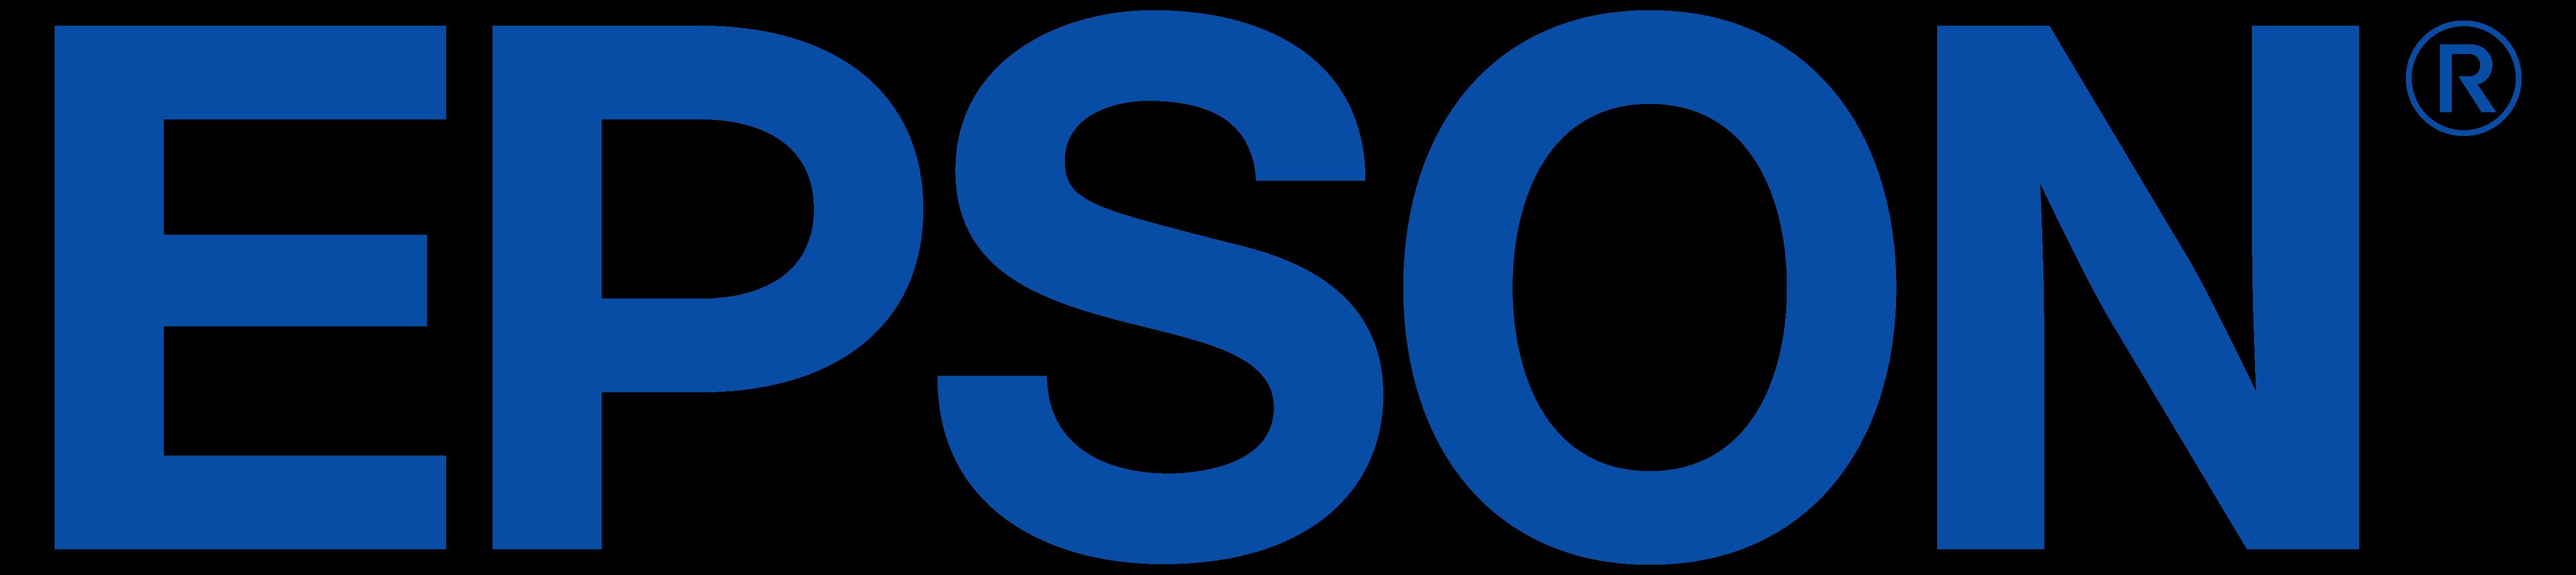 logo producenta